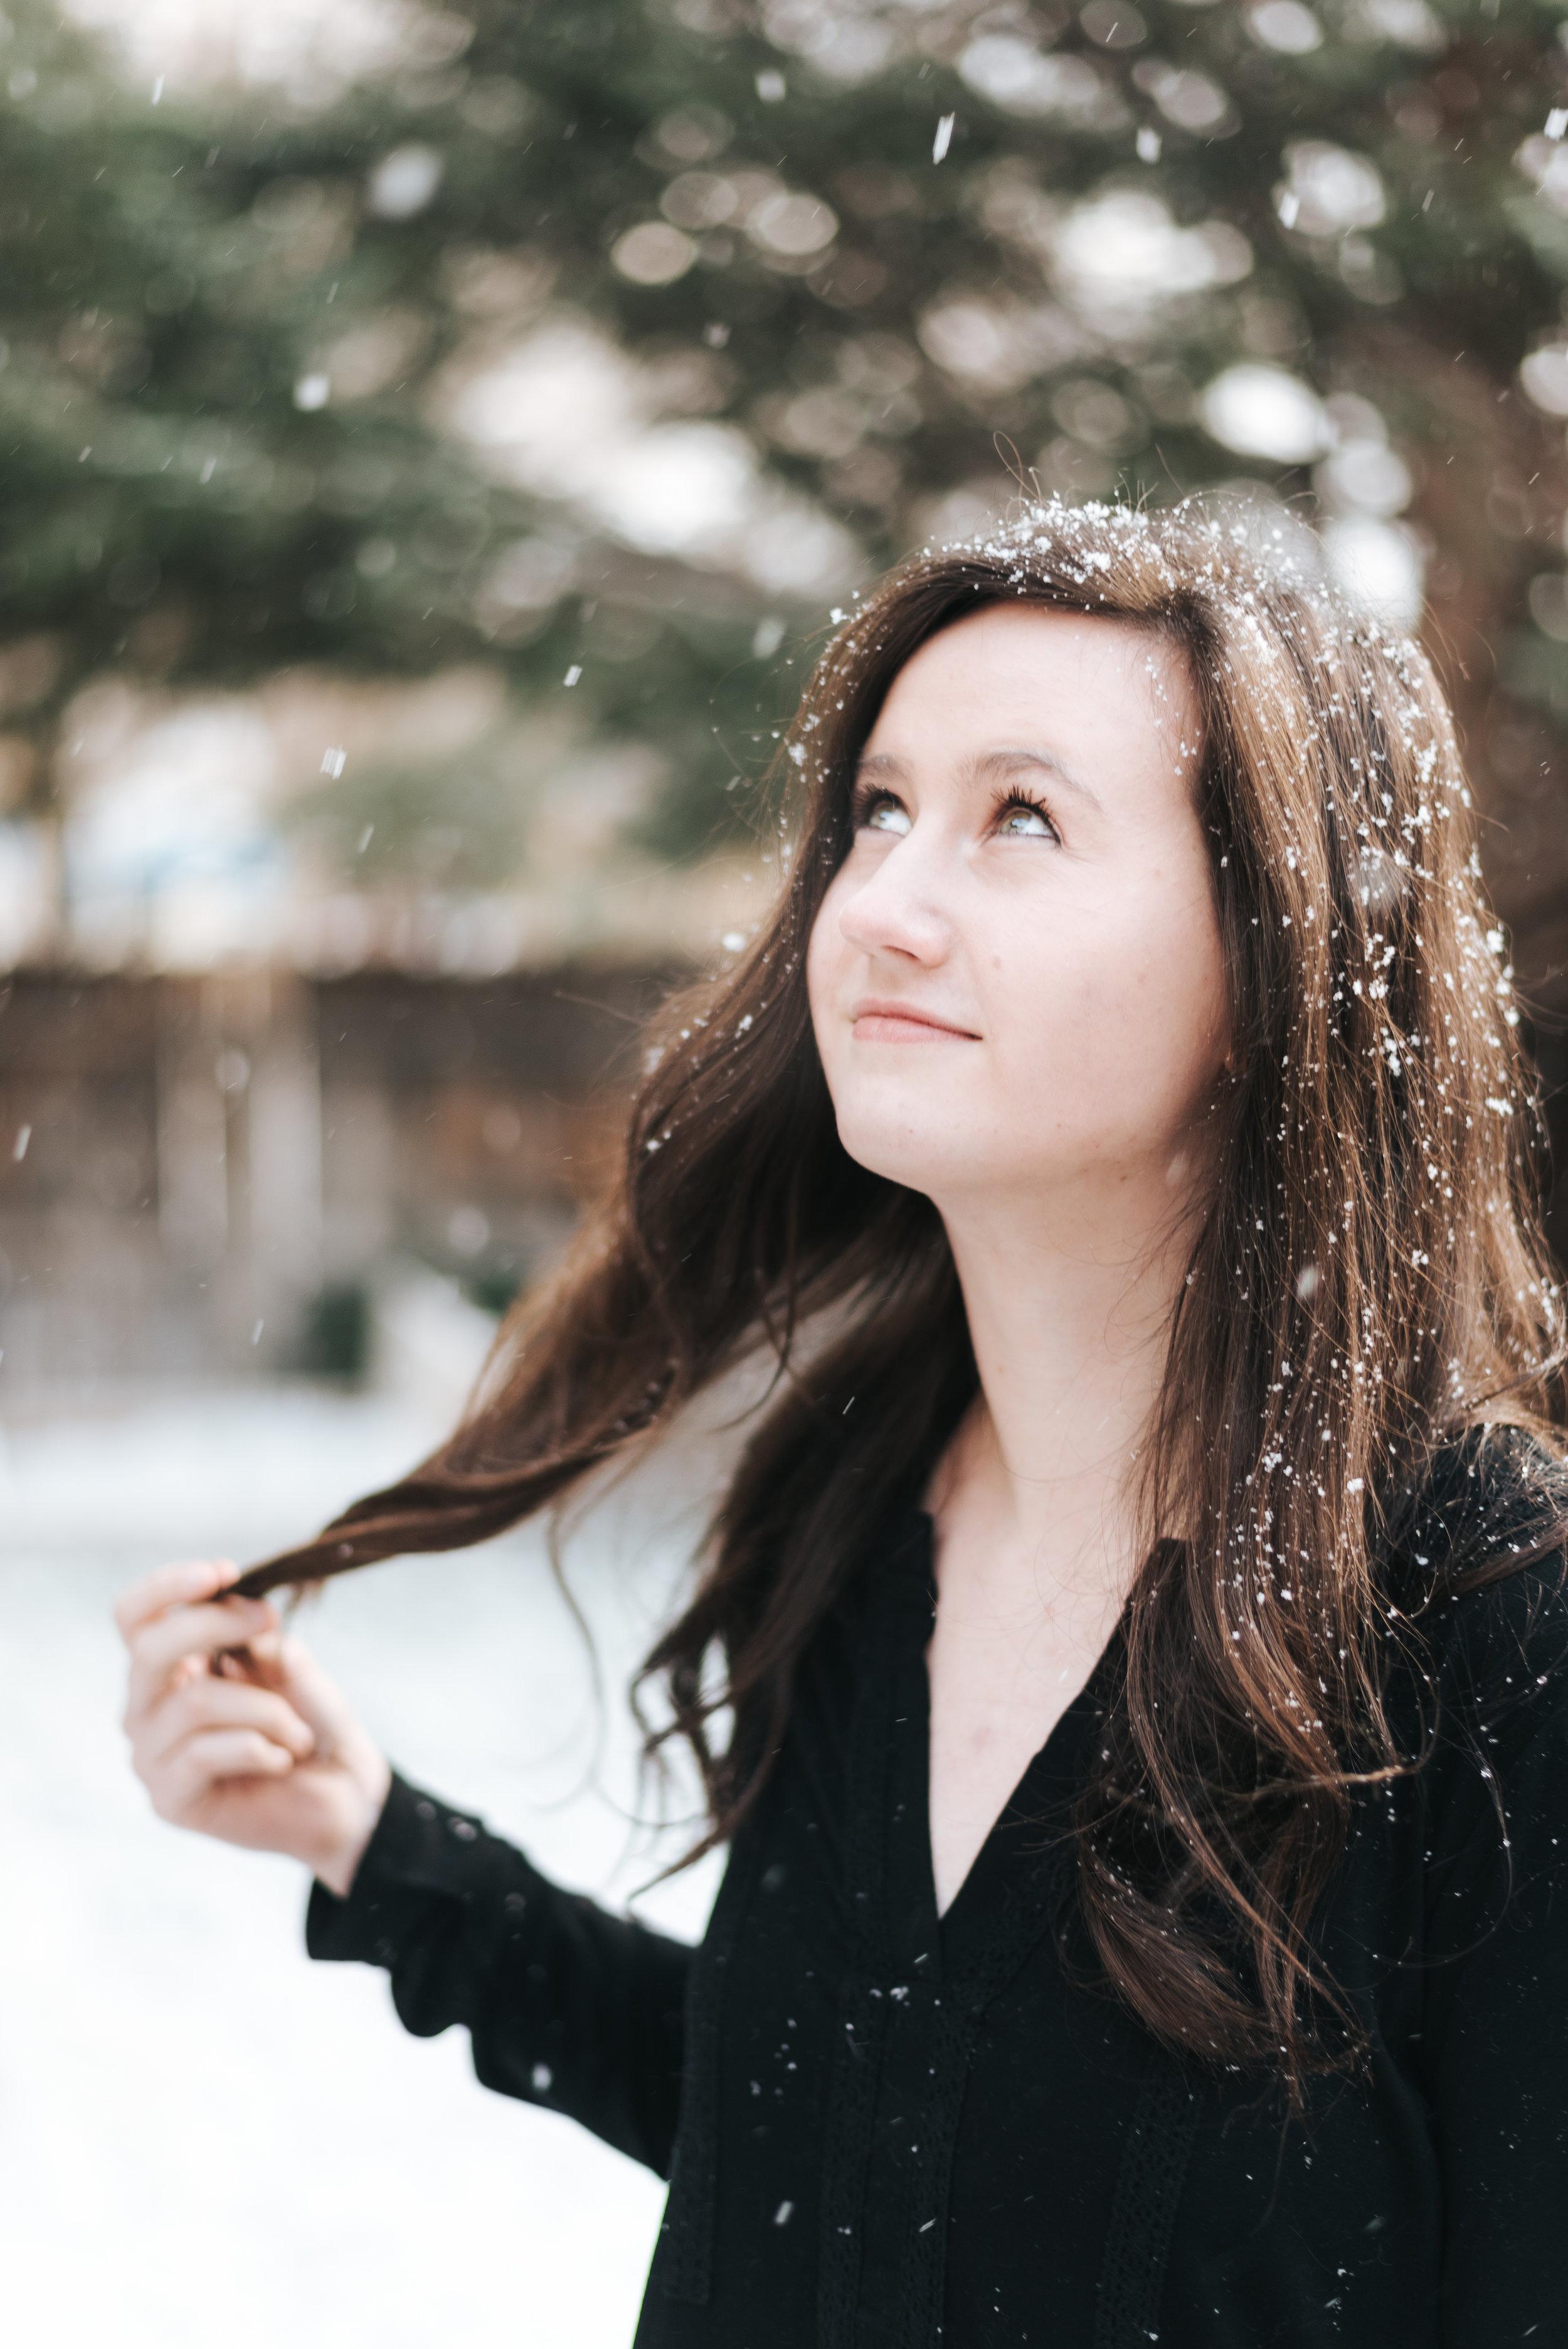 reno-nevada-senior-photographer-1.jpg